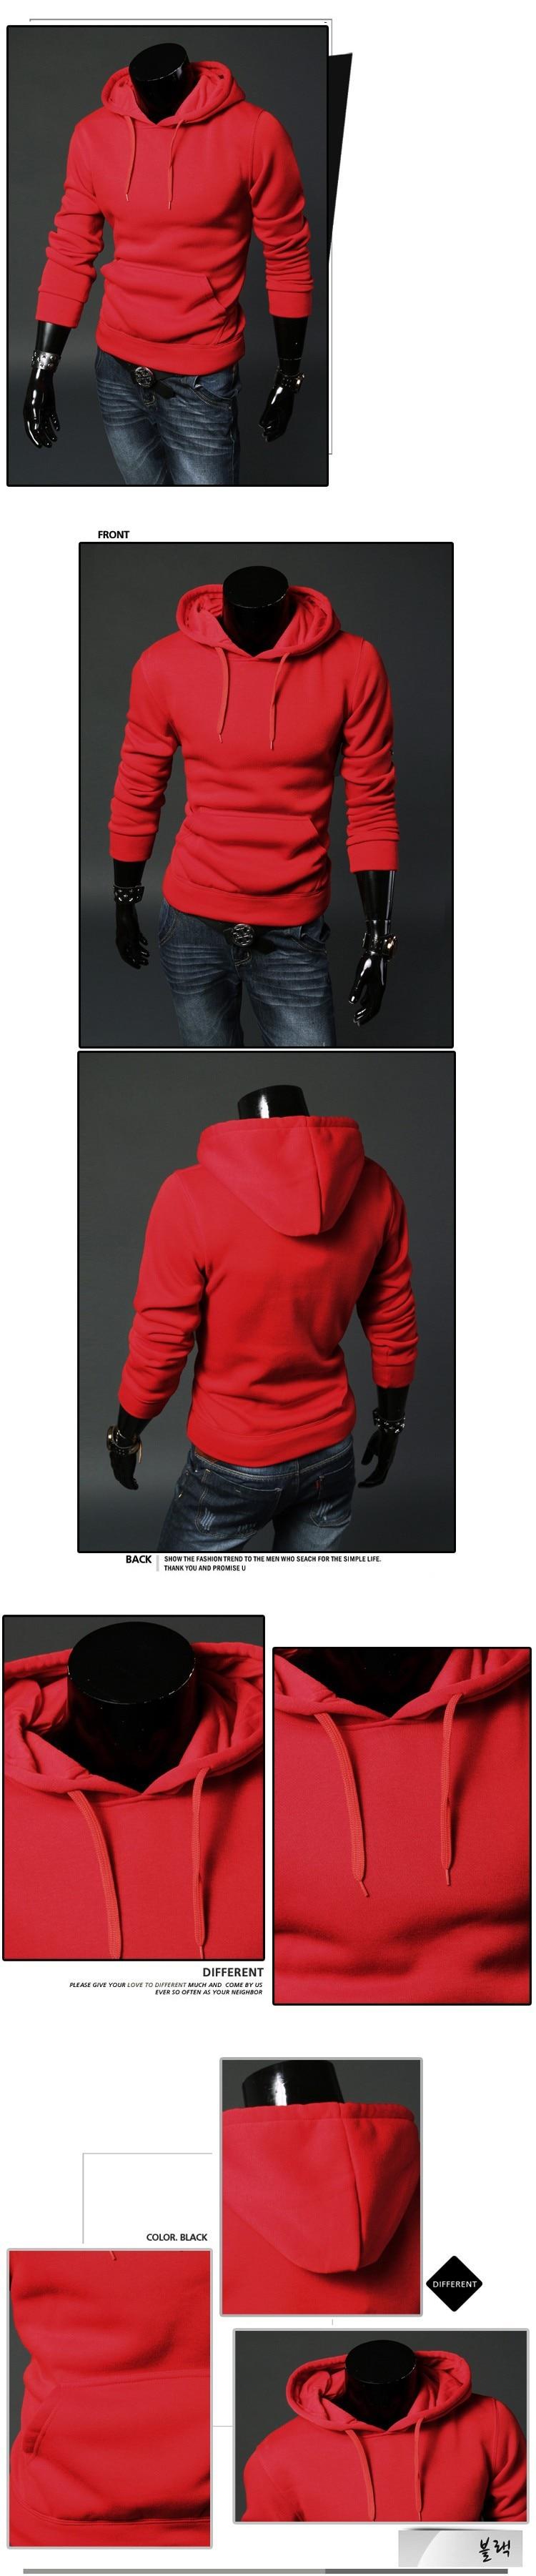 Winterautumn New Men's Clothes Korean Simple Fashion Boomer Mens Loose Set Head Sweaters Coat #9014William